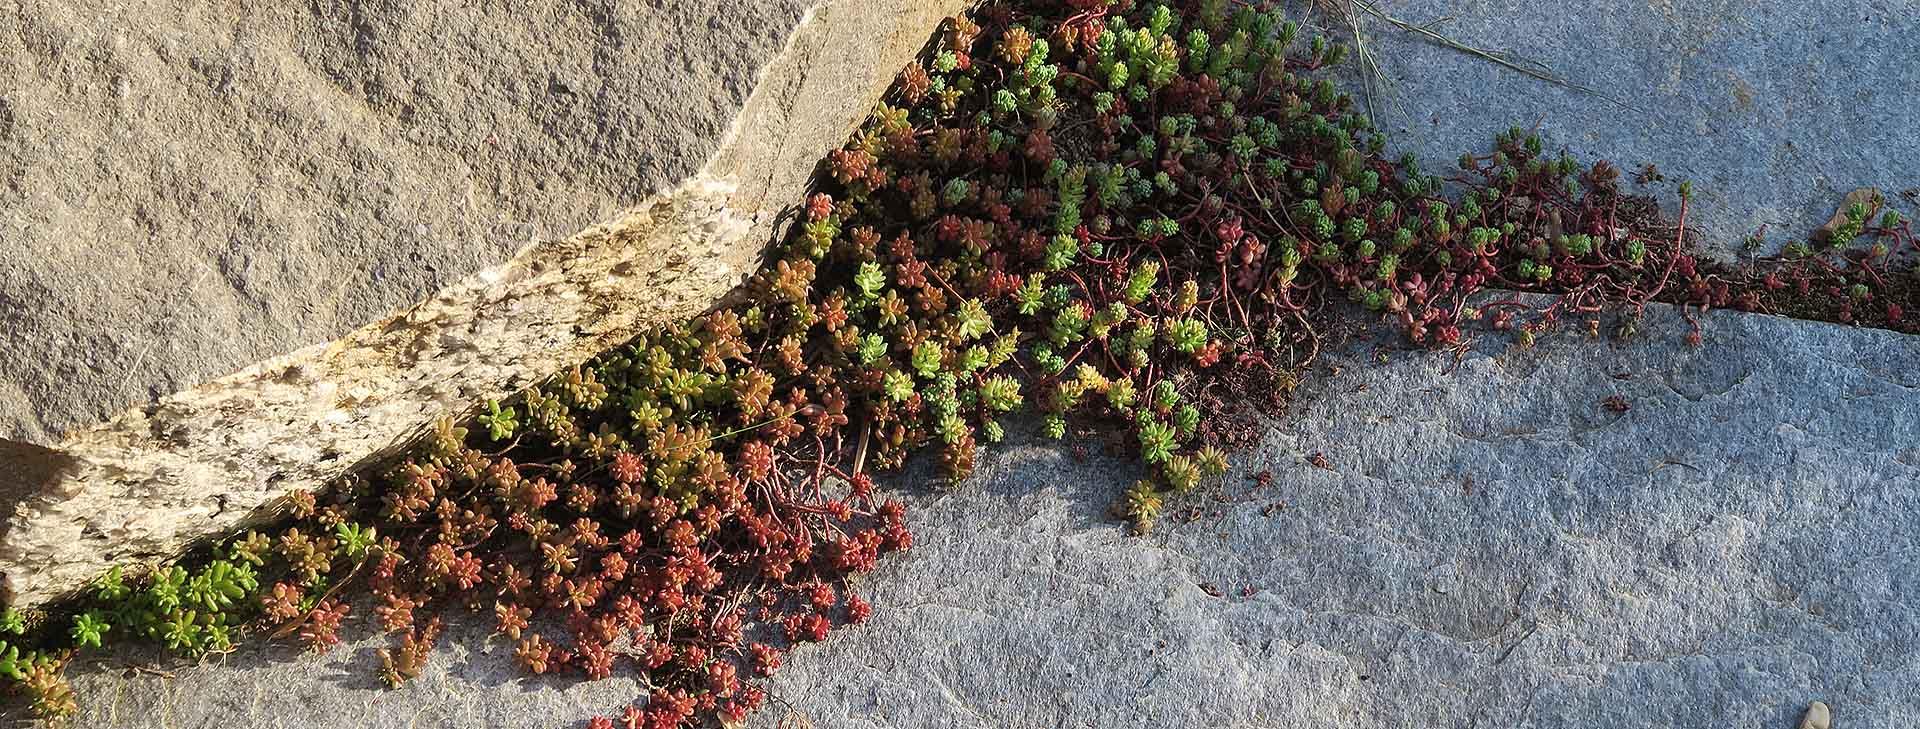 mineral-vegetal-dalles-granit-grès-sedum